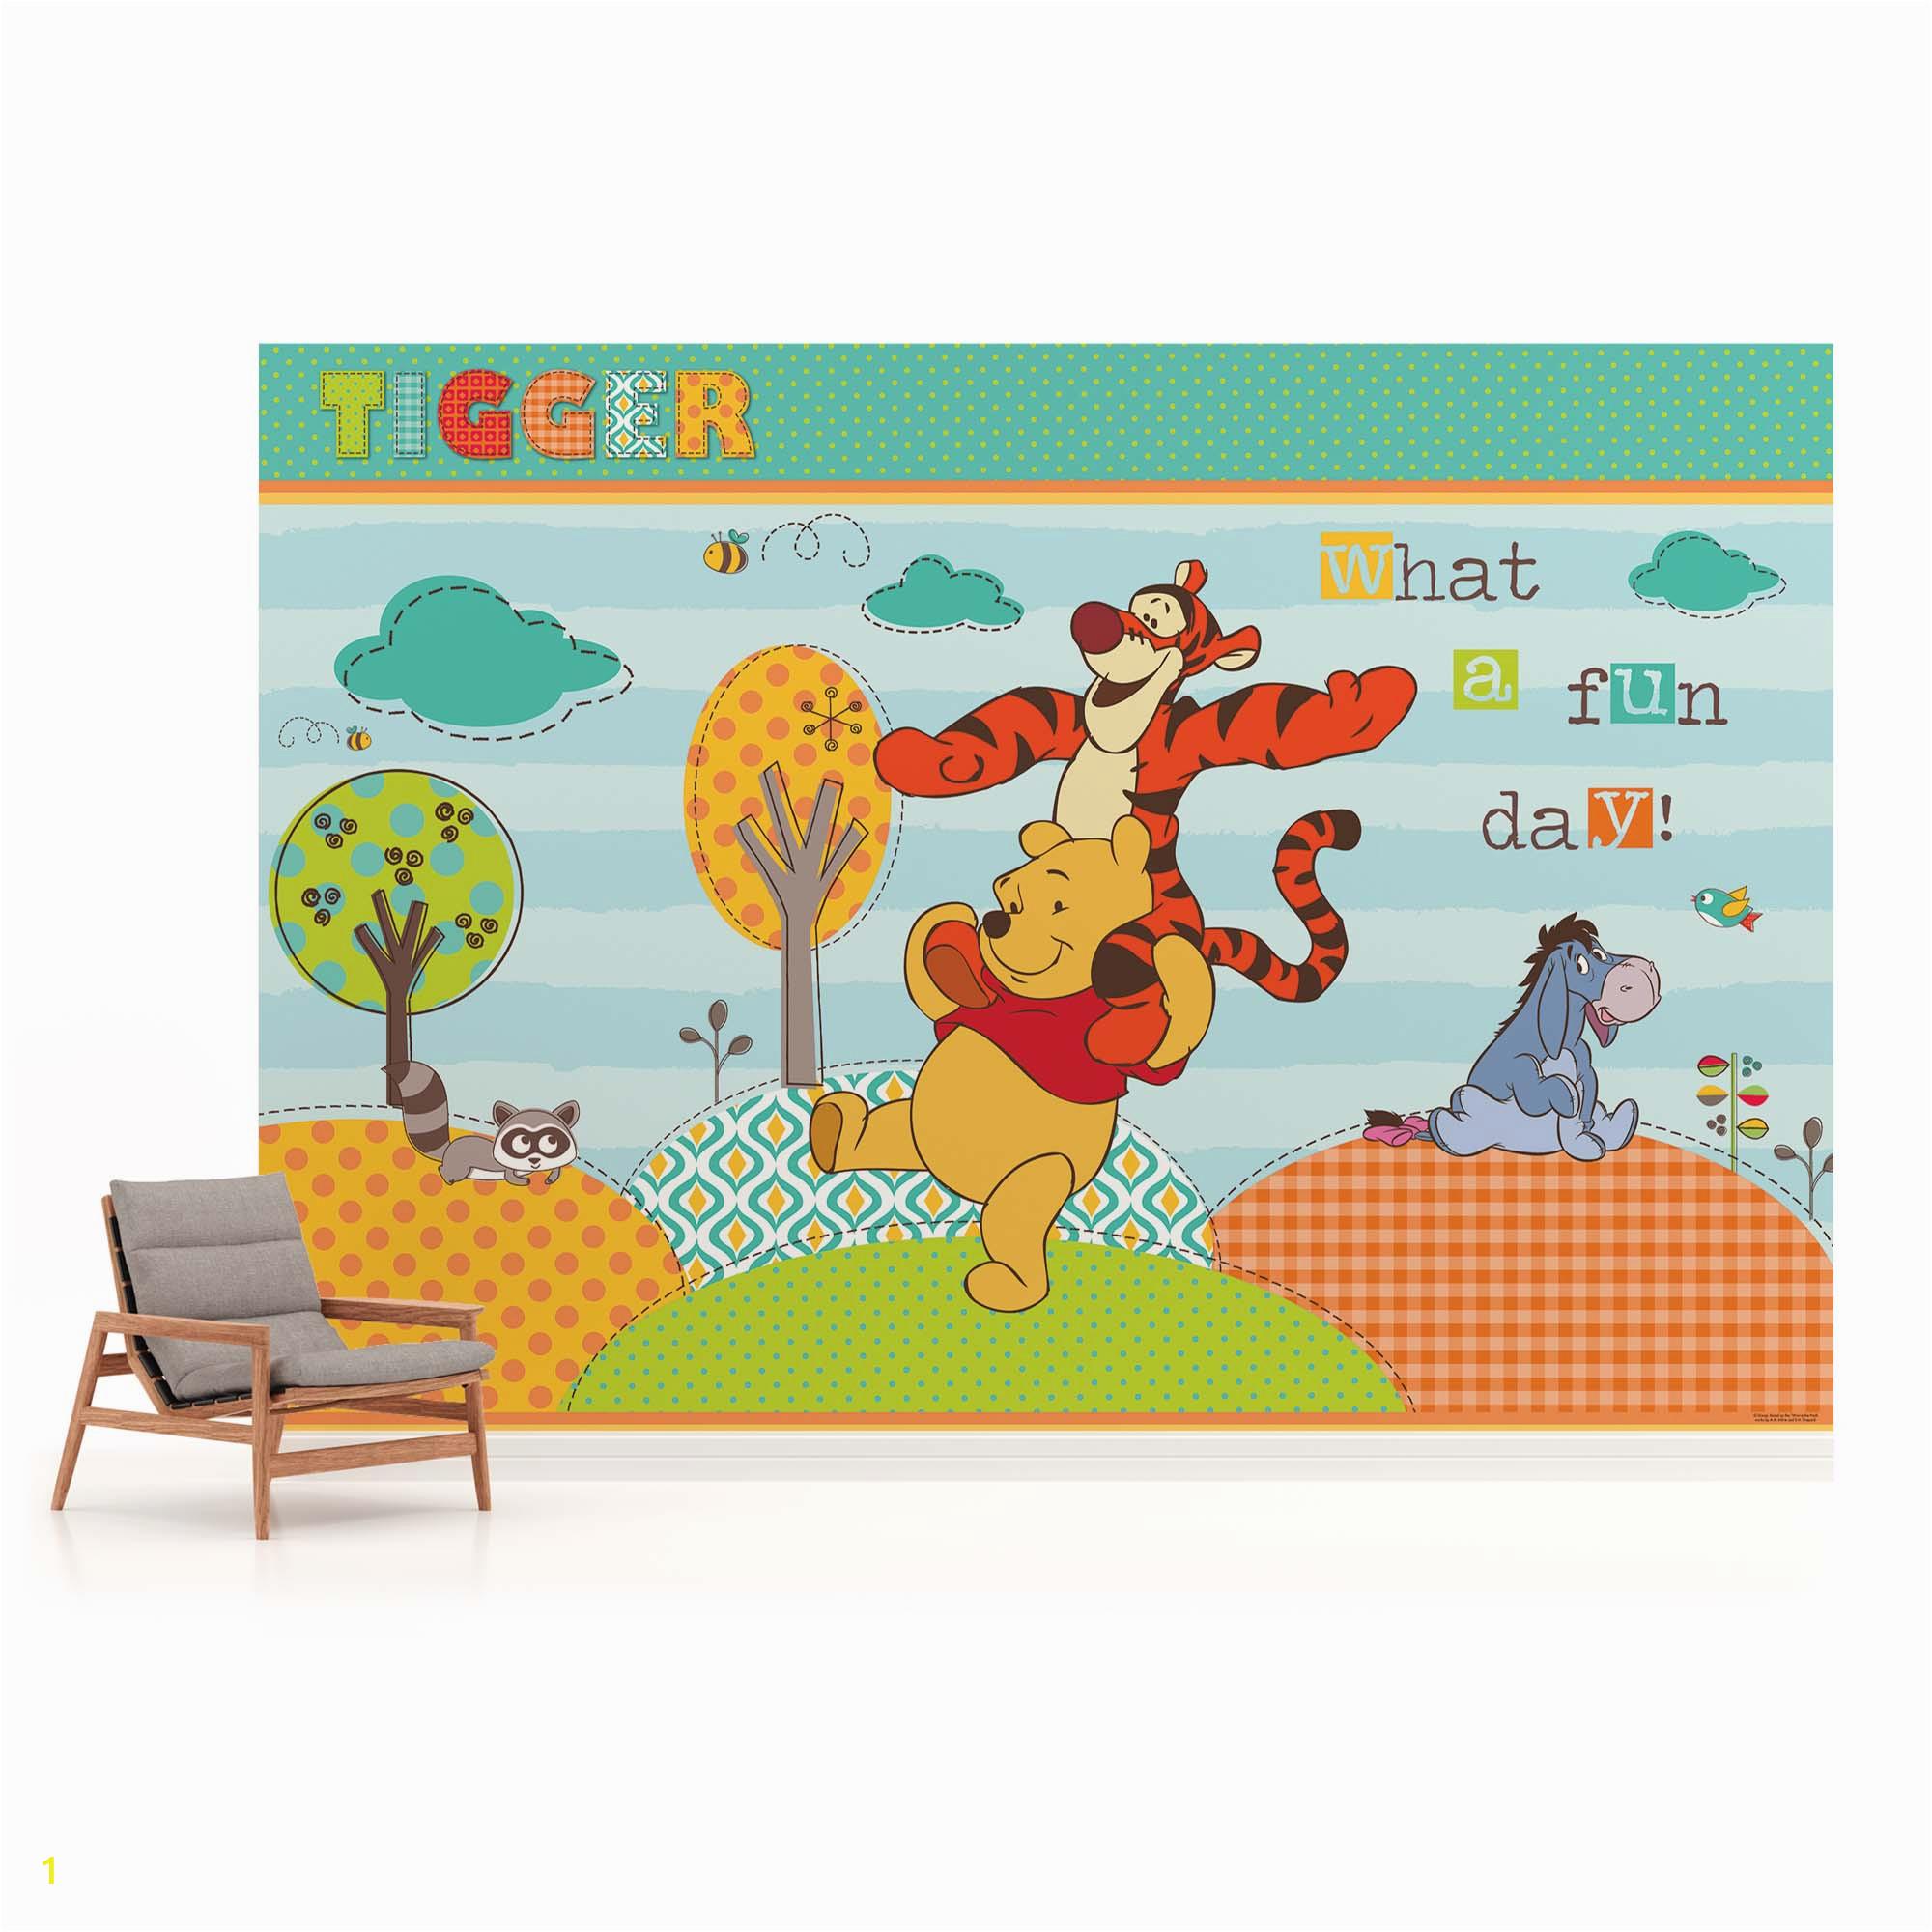 disney winnie the pooh wallpaper [2] 1 p